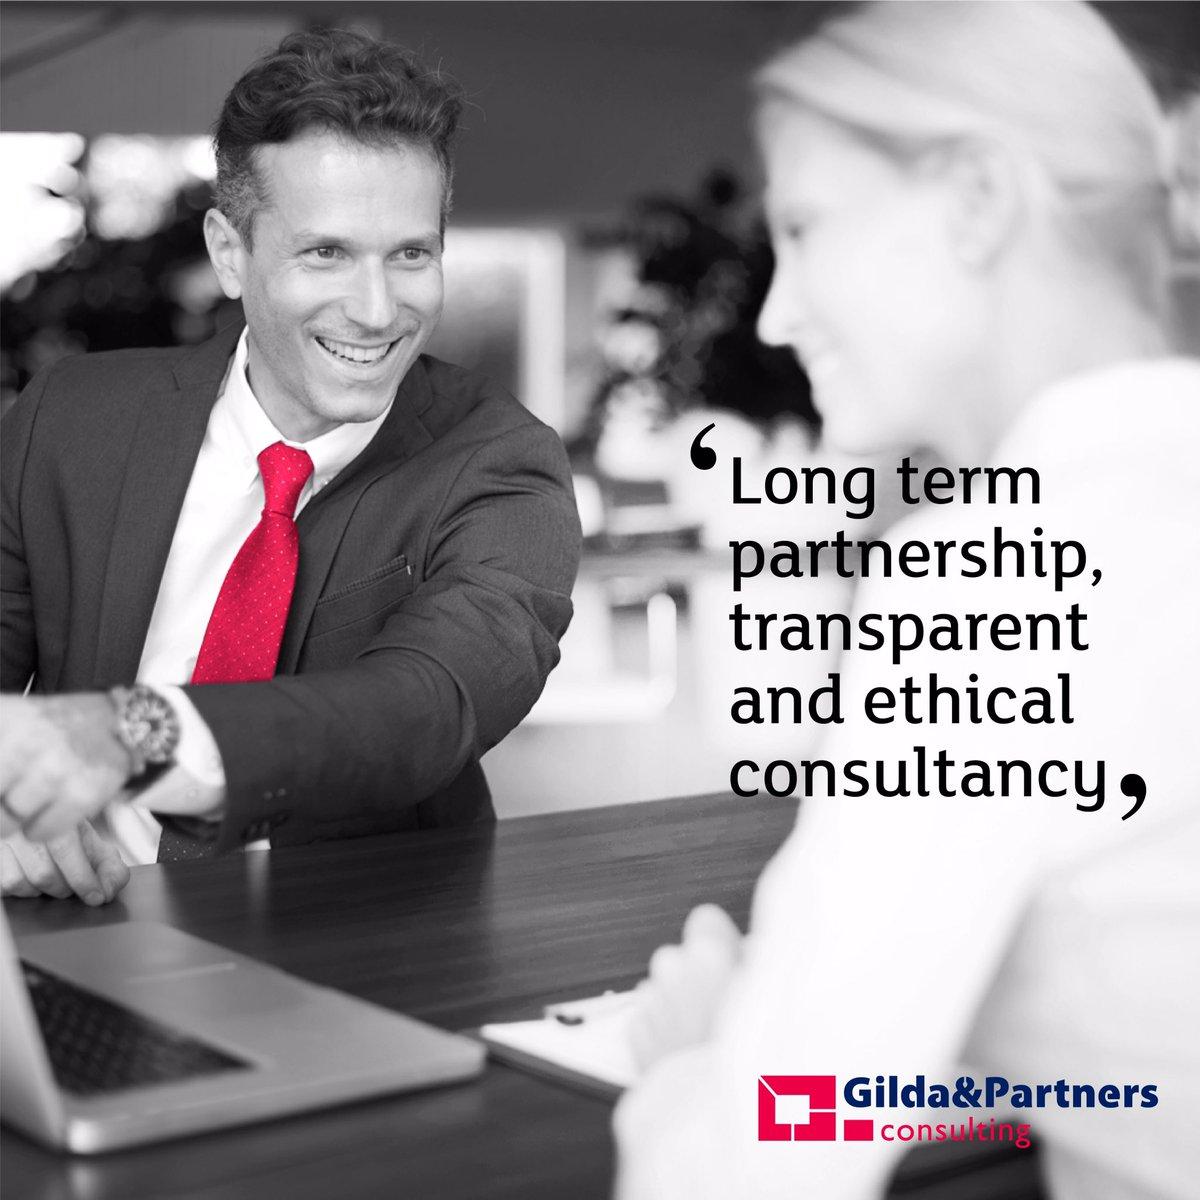 long term partner somc subscribe - HD1200×1200